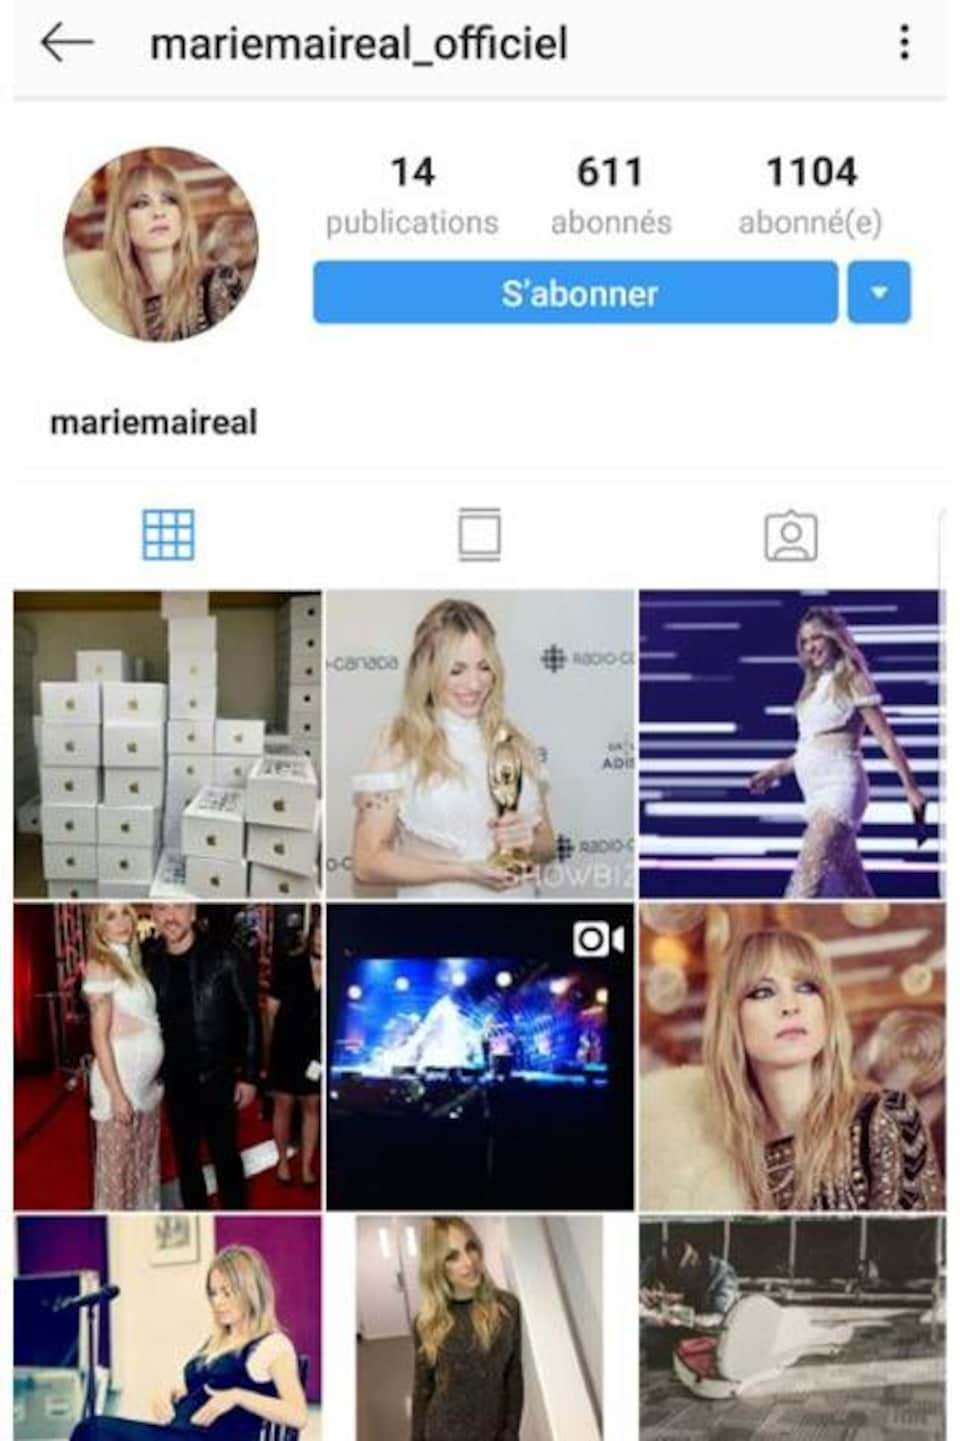 Aperçu d'un faux profil de Marie-Mai sur Instagram.